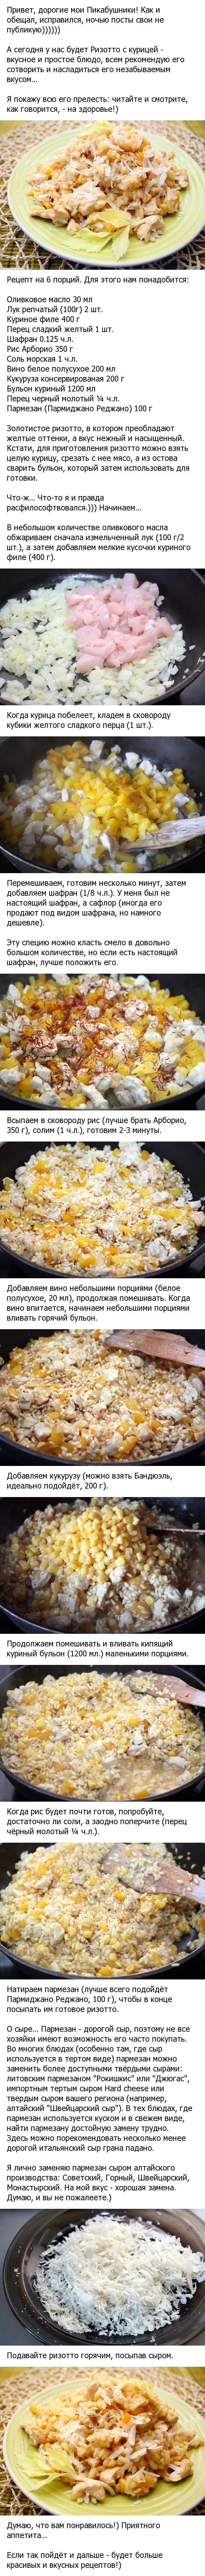 А как с утра насчёт Ризотто с курицей?) Длиннопост от beliy Кулинария, Рецепт, Ризотто с курицей, Длиннопост